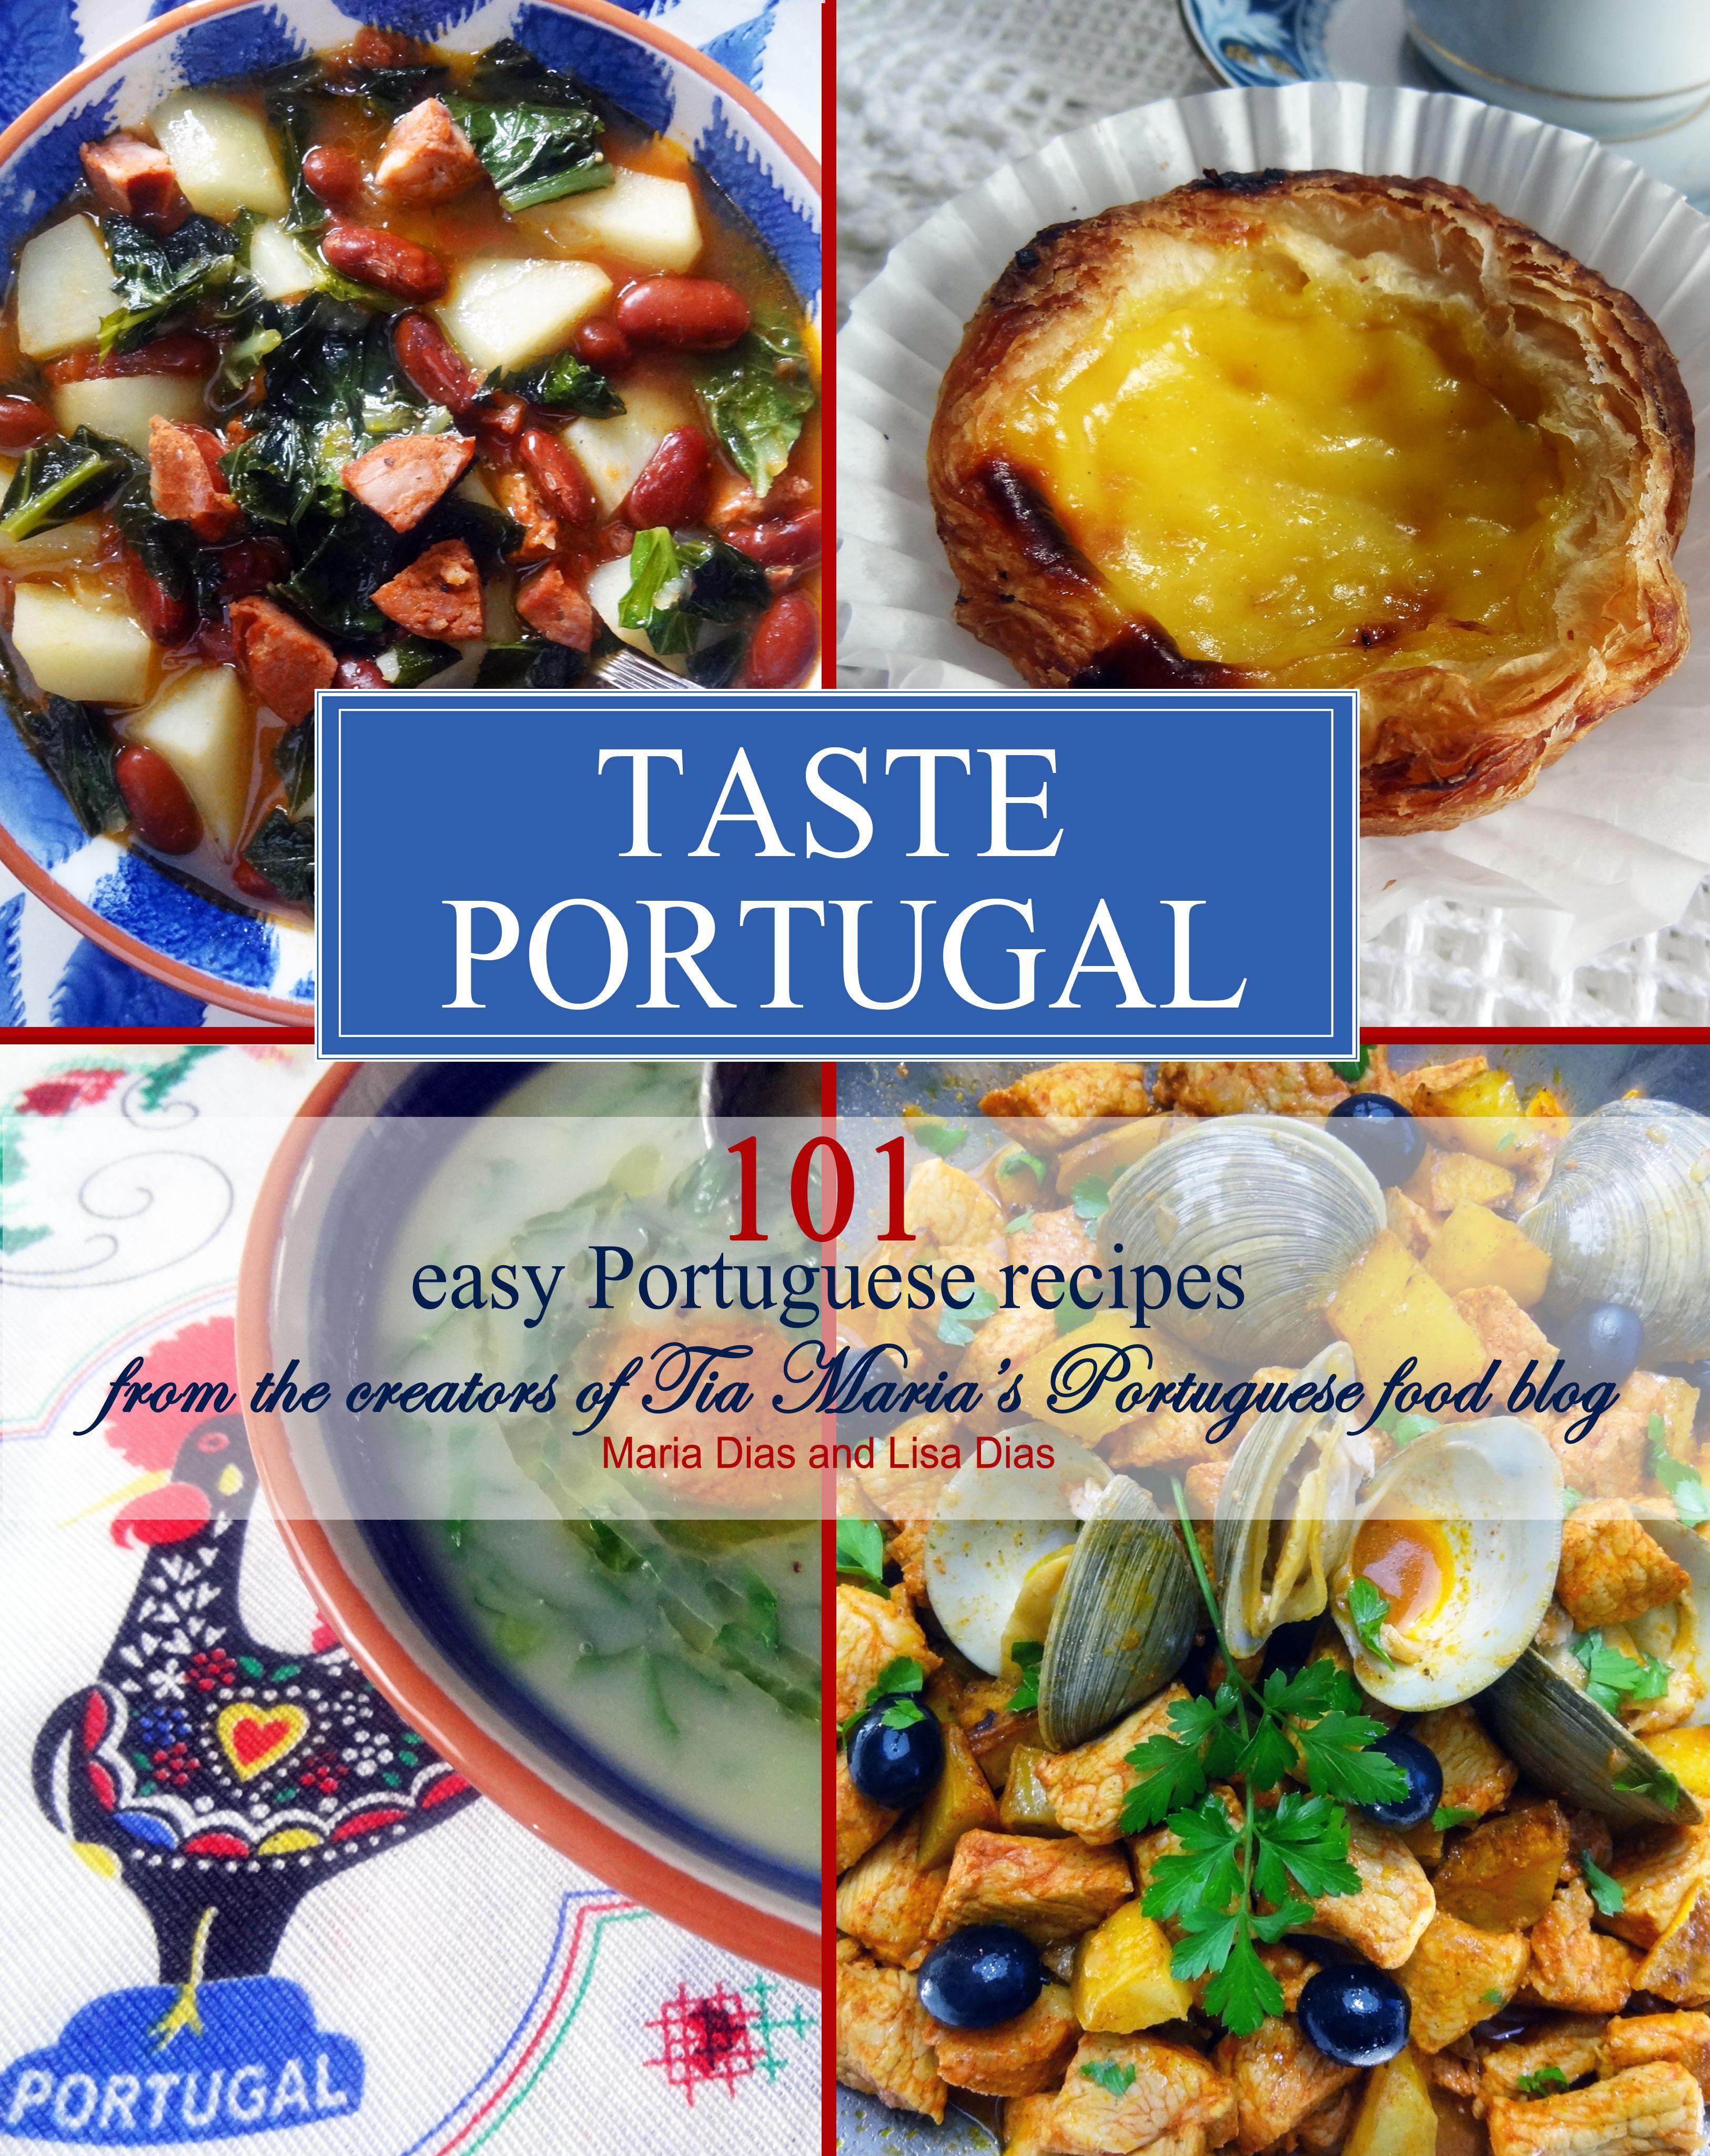 Taste portugal 101 easy portuguese recipes cookbook from tia taste portugal 101 easy portuguese recipes cookbook from tia marias portuguese food blog coming forumfinder Choice Image